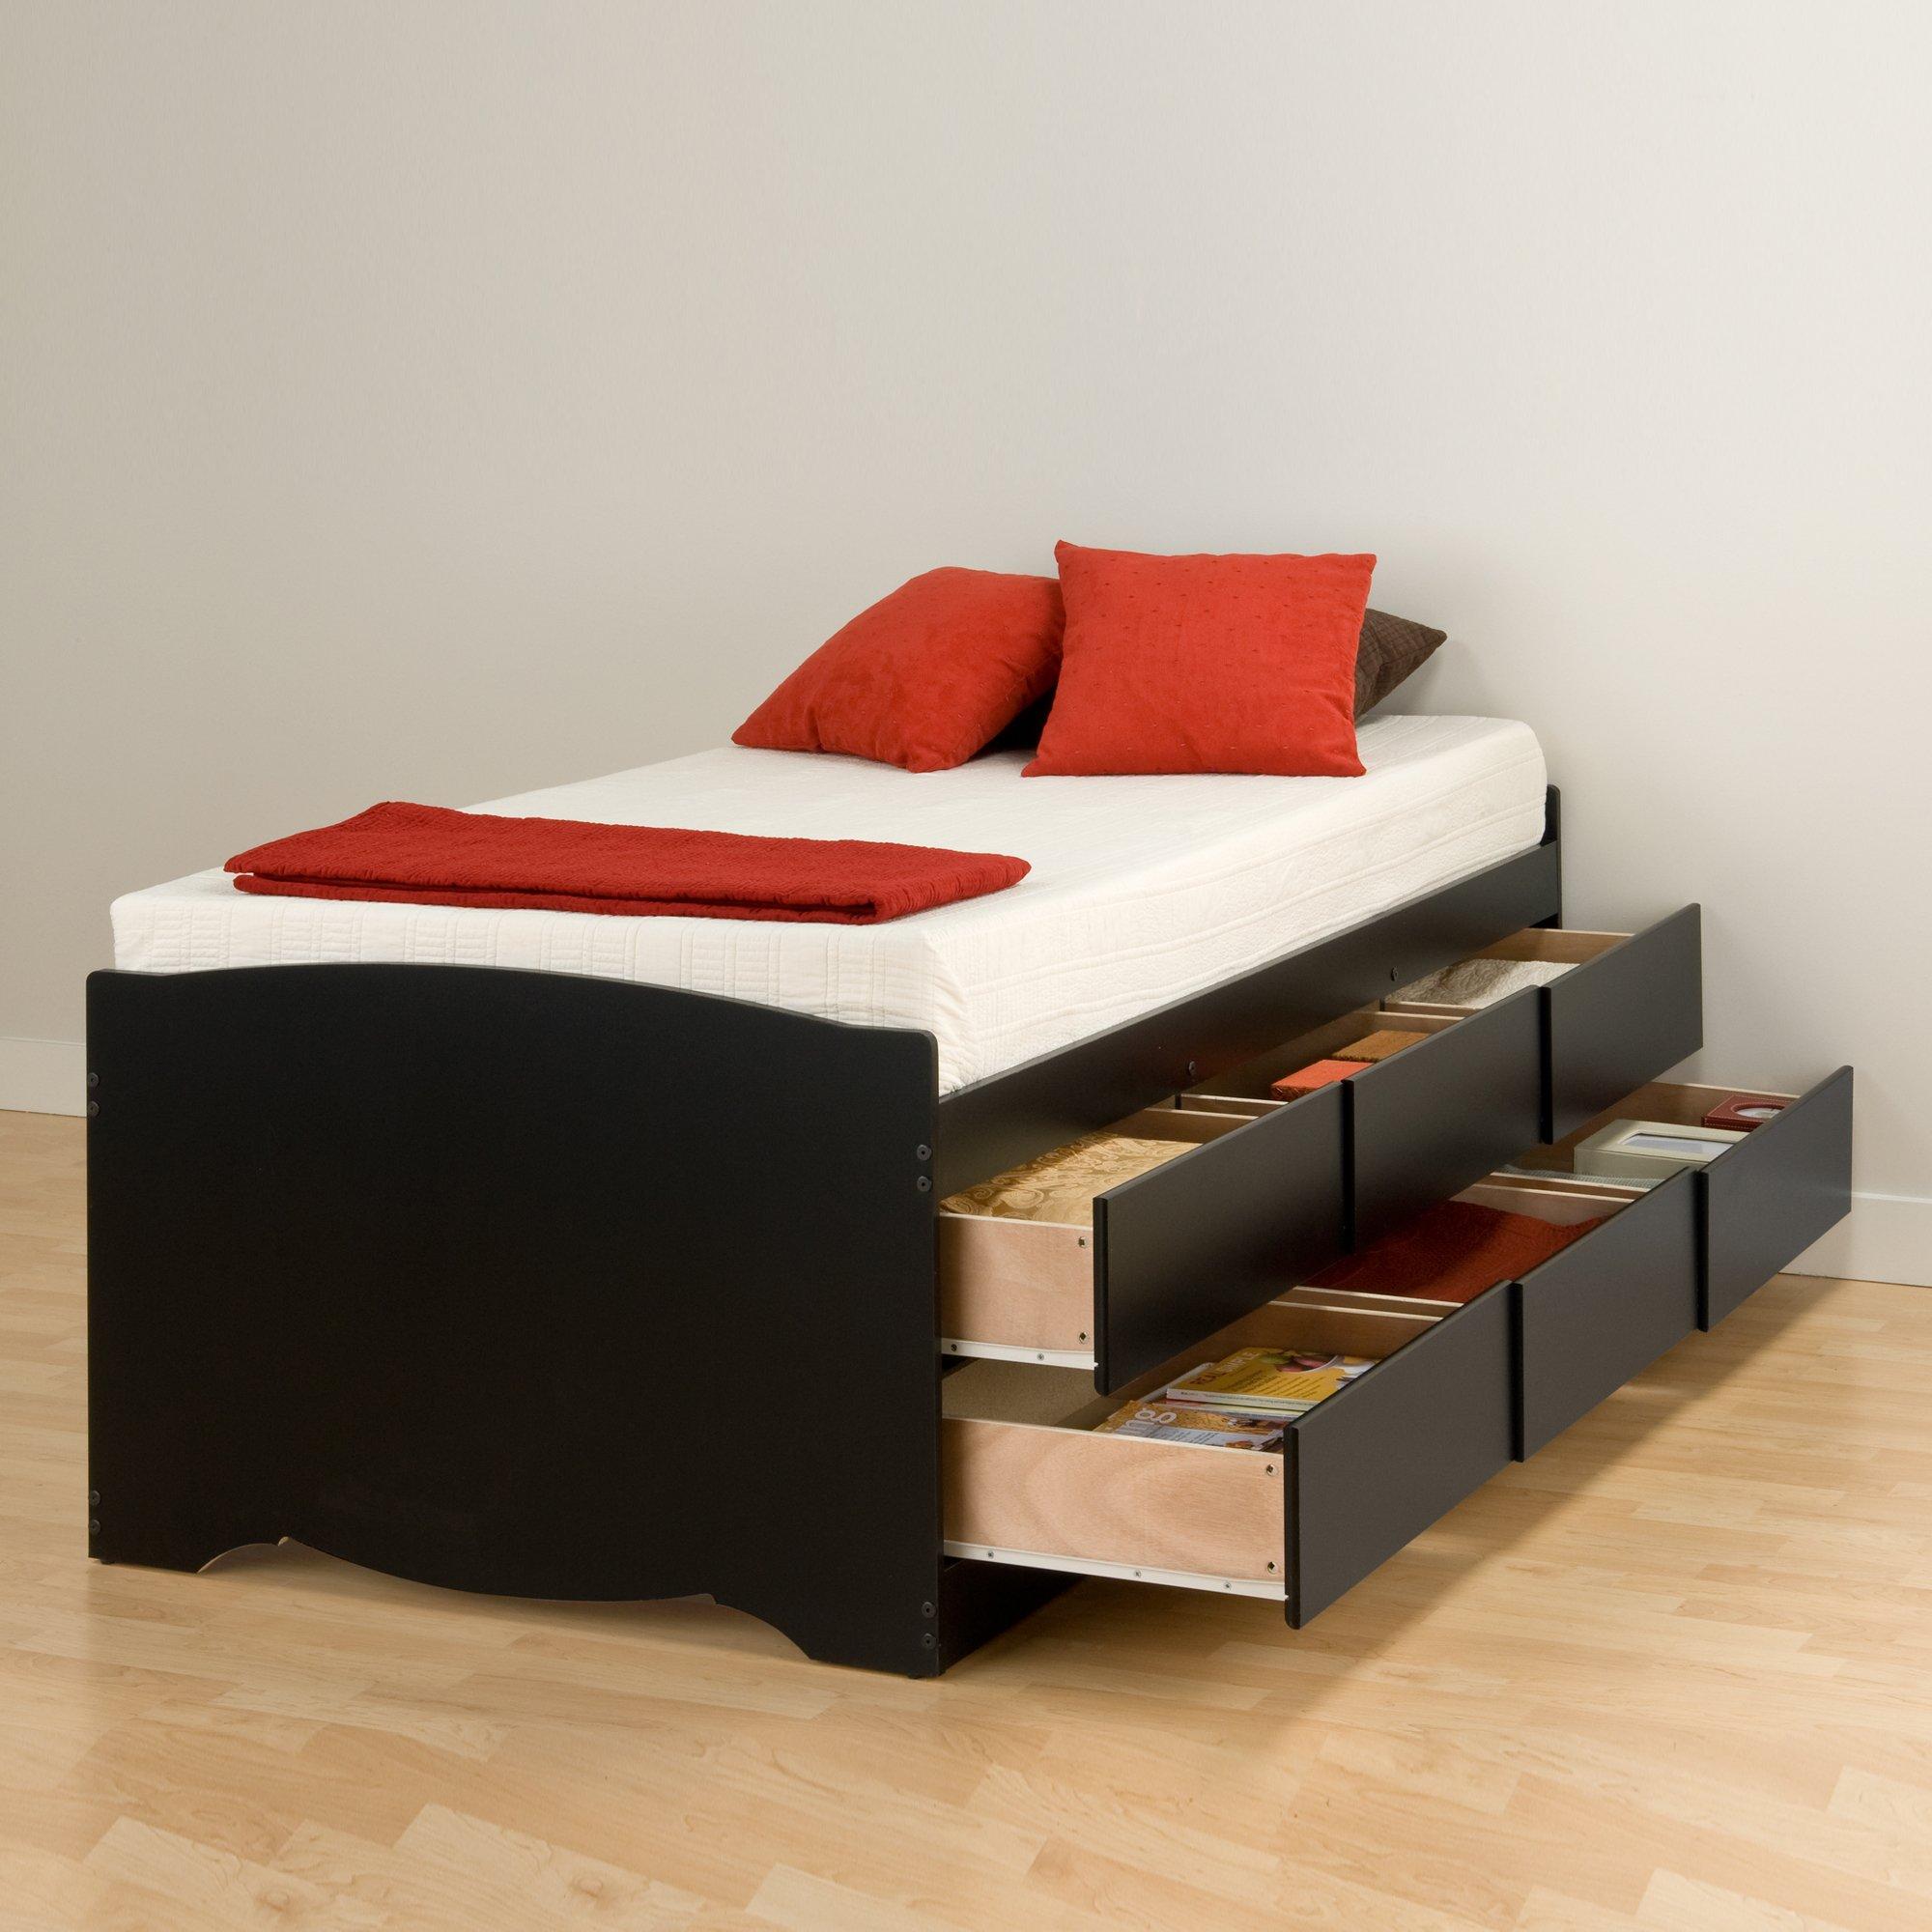 Prepac BBT-4106 Tall Twin Sonoma Platform Storage Bed with 6 Drawers, Black Mattress, by Prepac